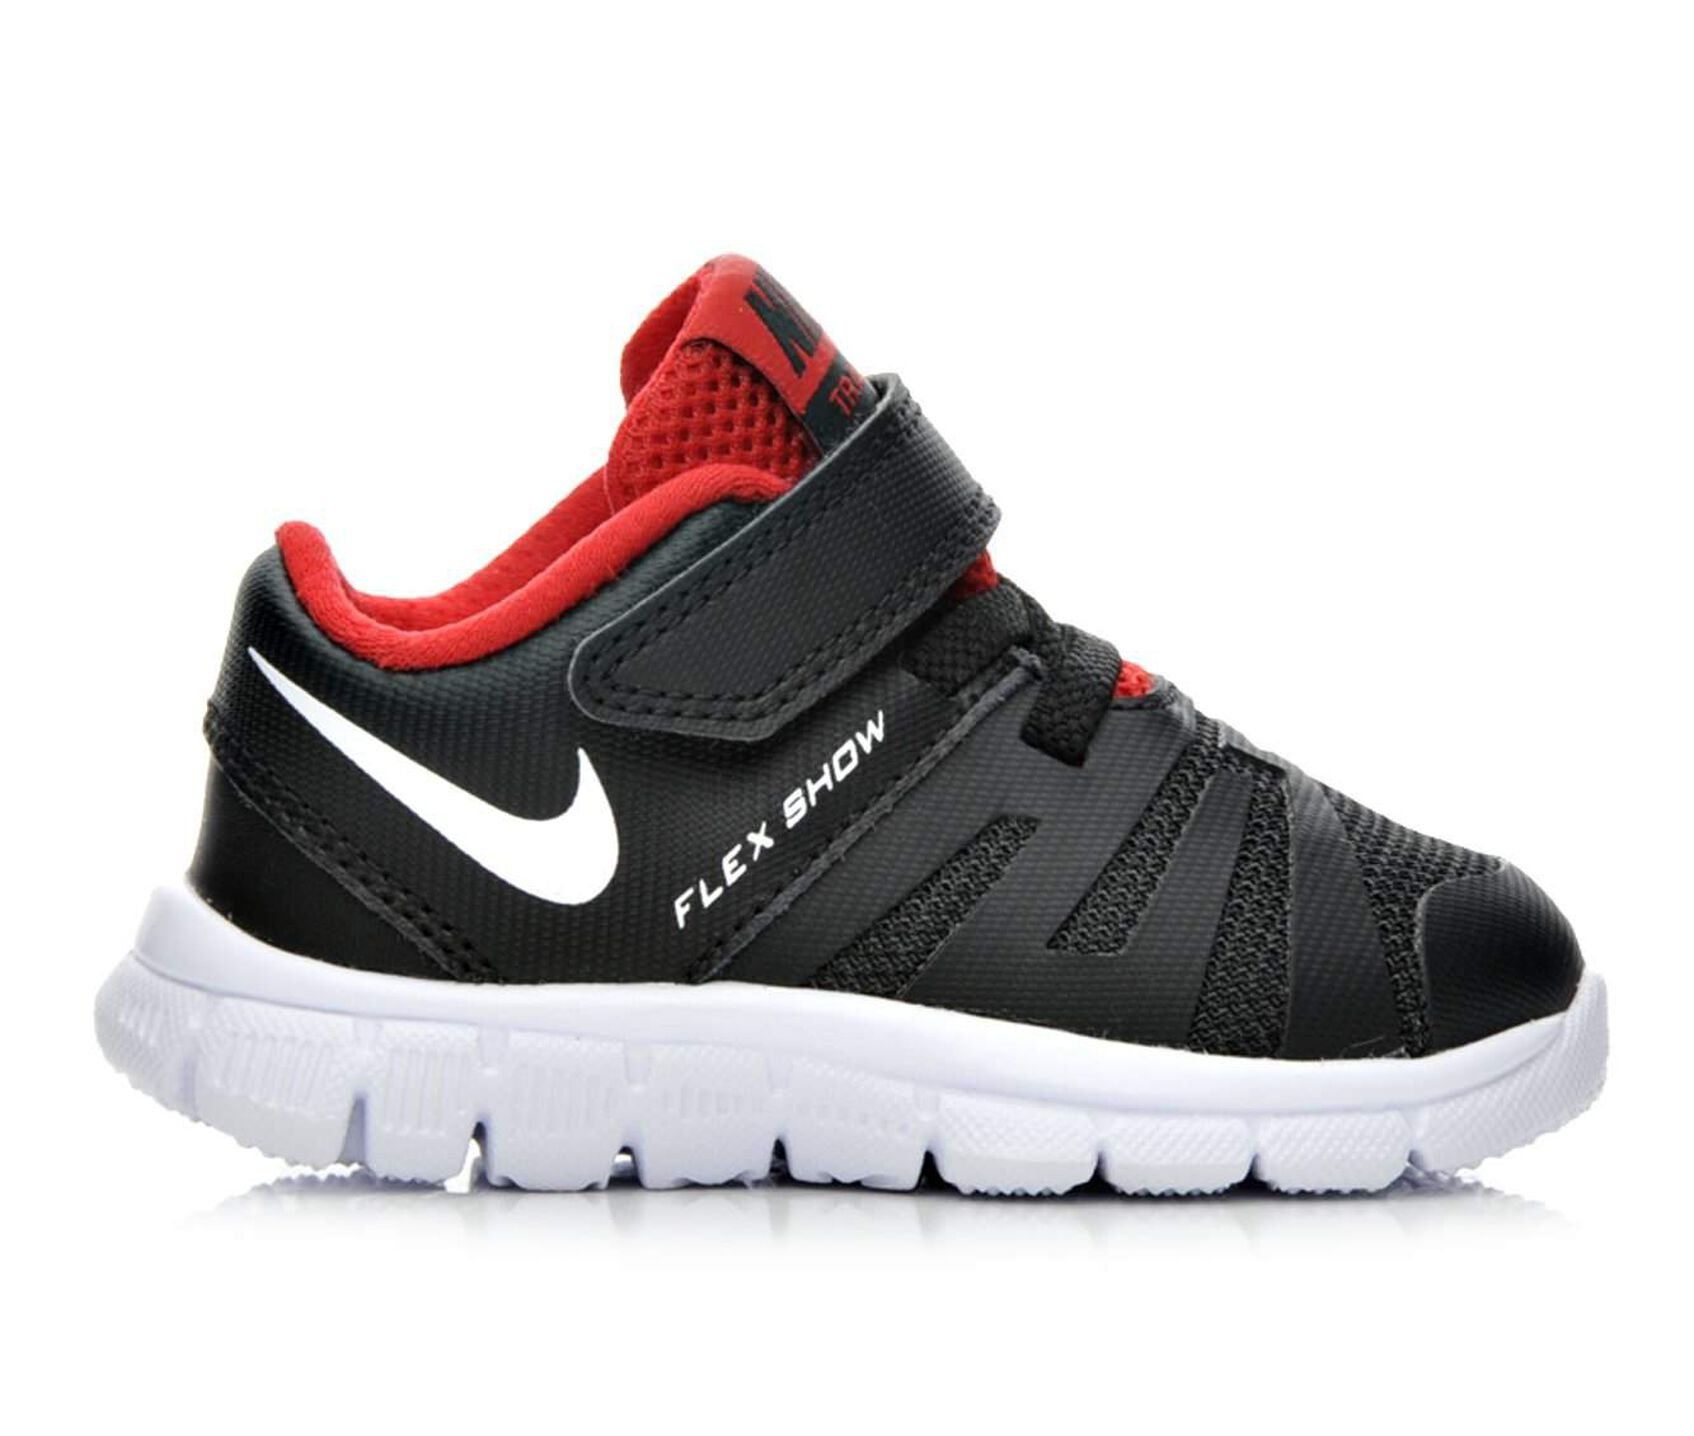 Boys' Nike Infant Flex Show TR 5 Boys Athletic Shoes